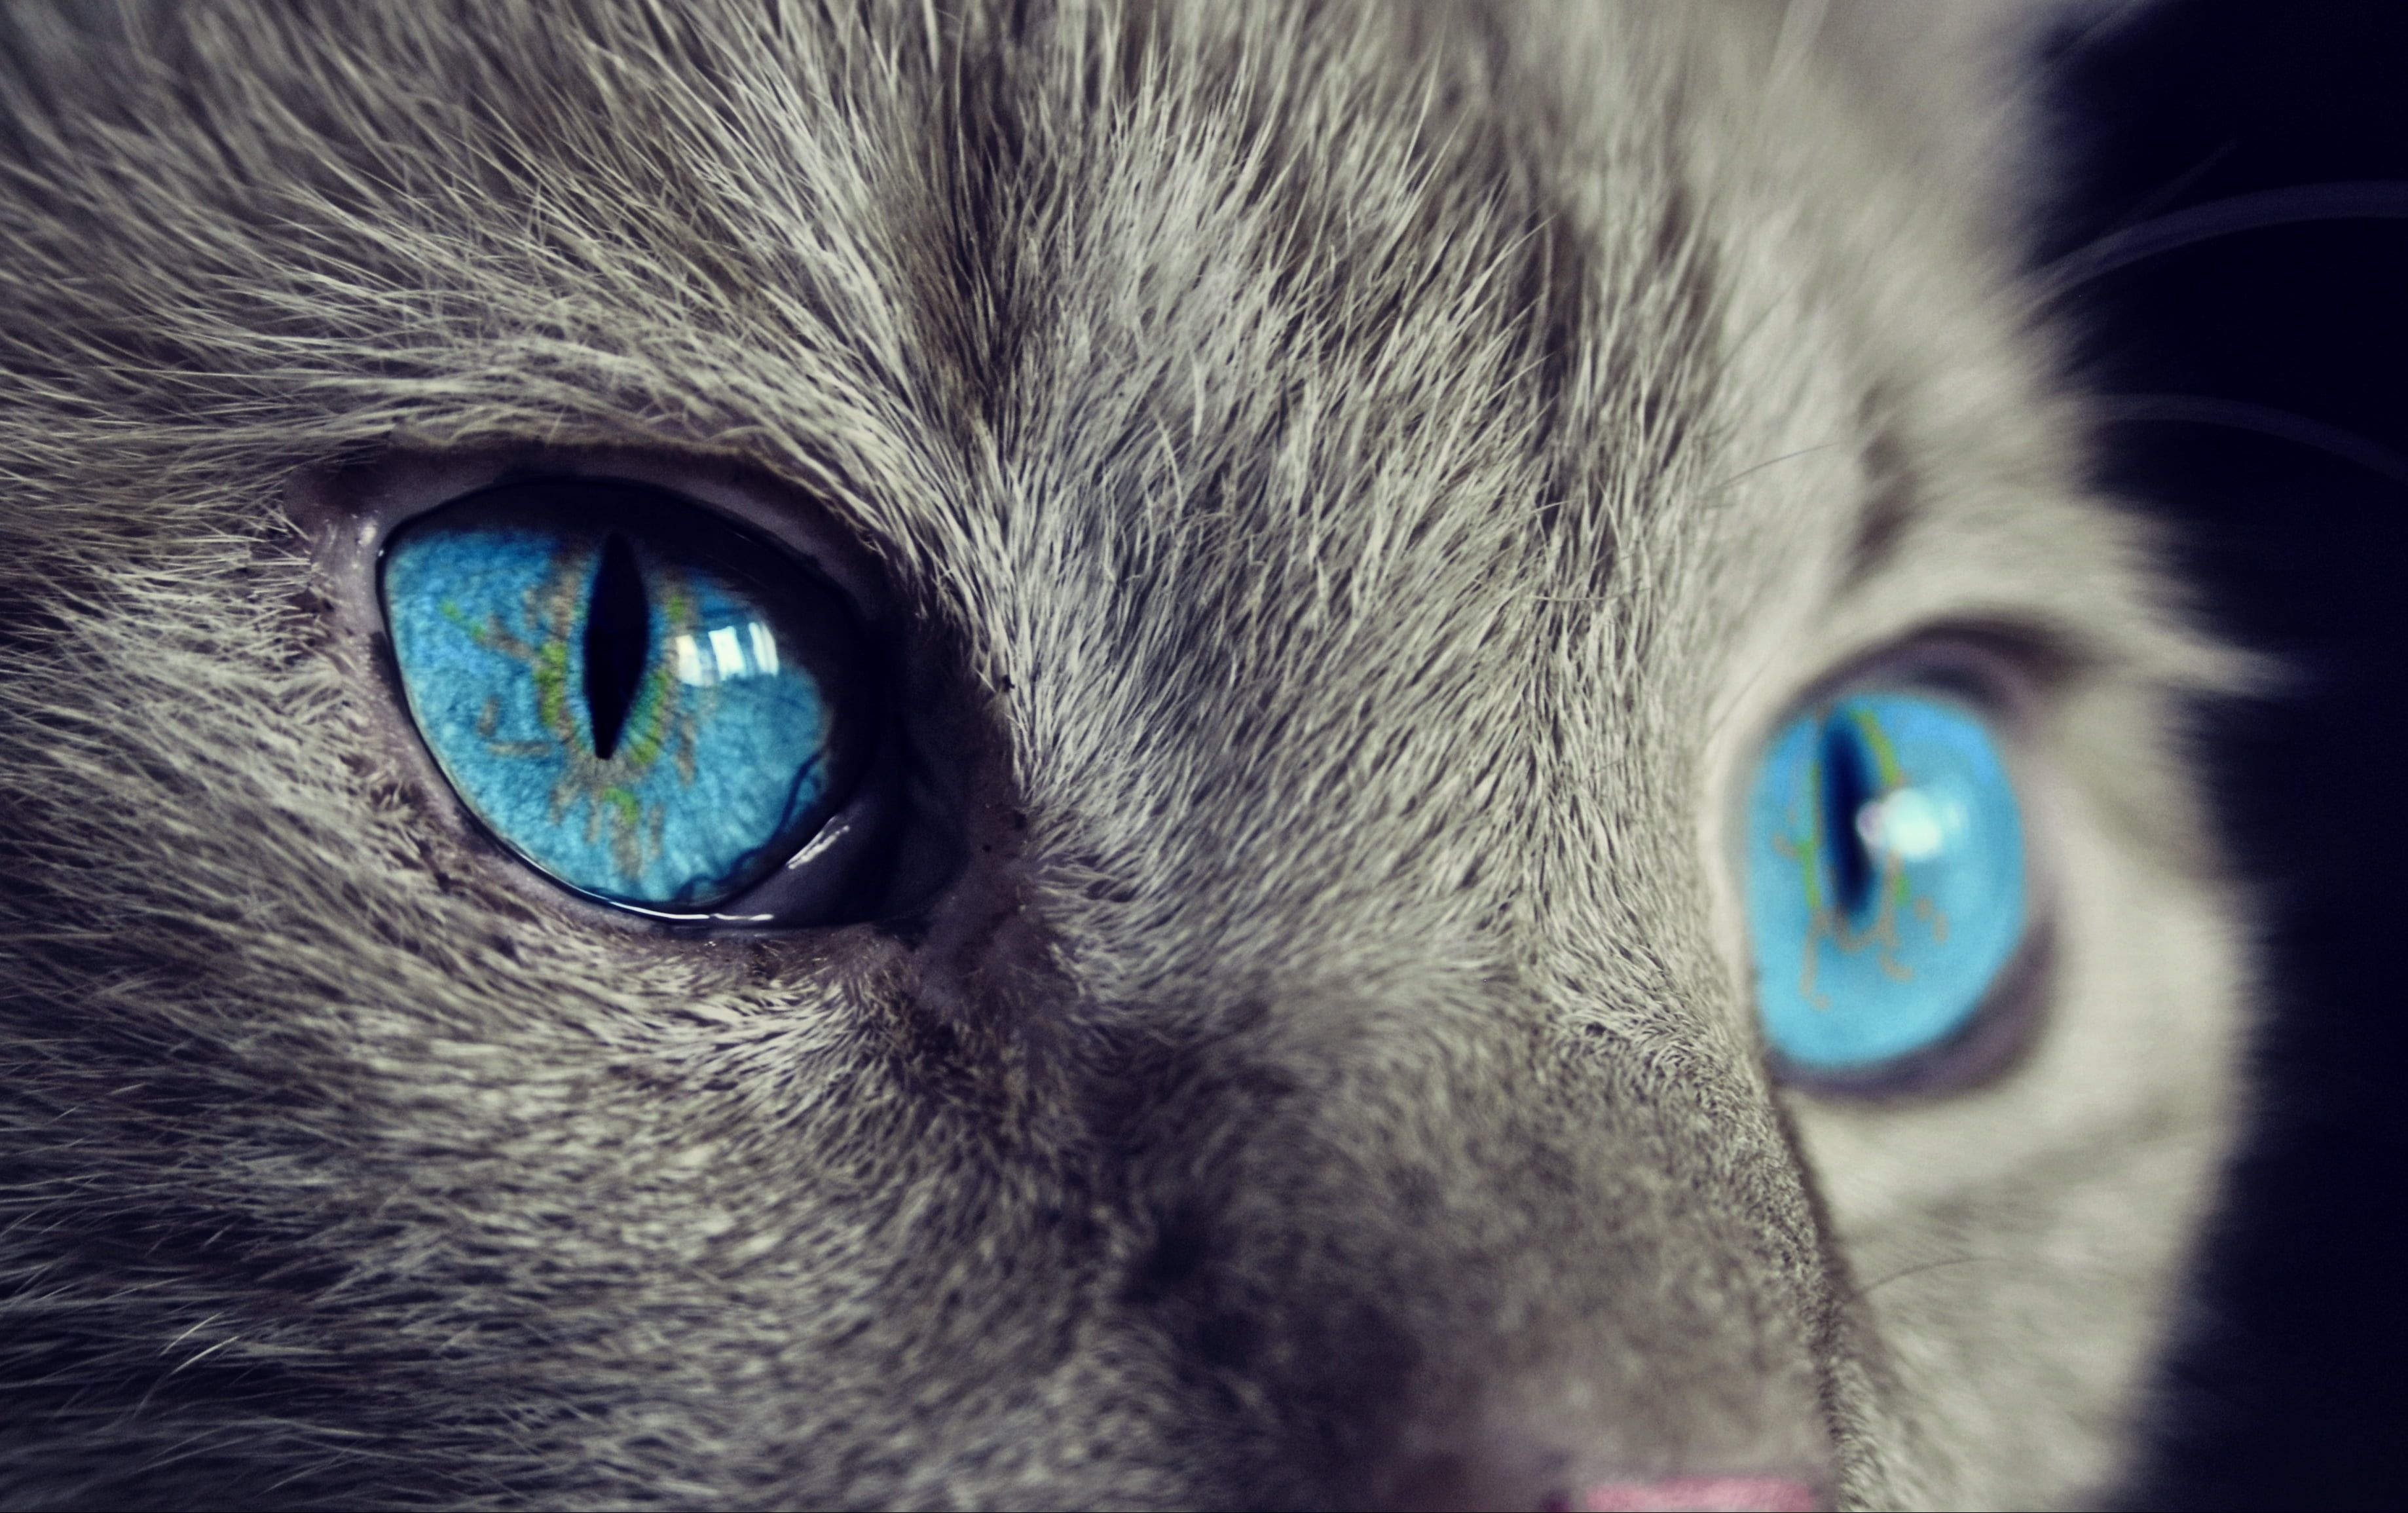 Blue Eyed Grey Cat Cat Face Blue Eyes 2k Wallpaper Hdwallpaper Desktop In 2020 Cat With Blue Eyes Cats Grey Cats